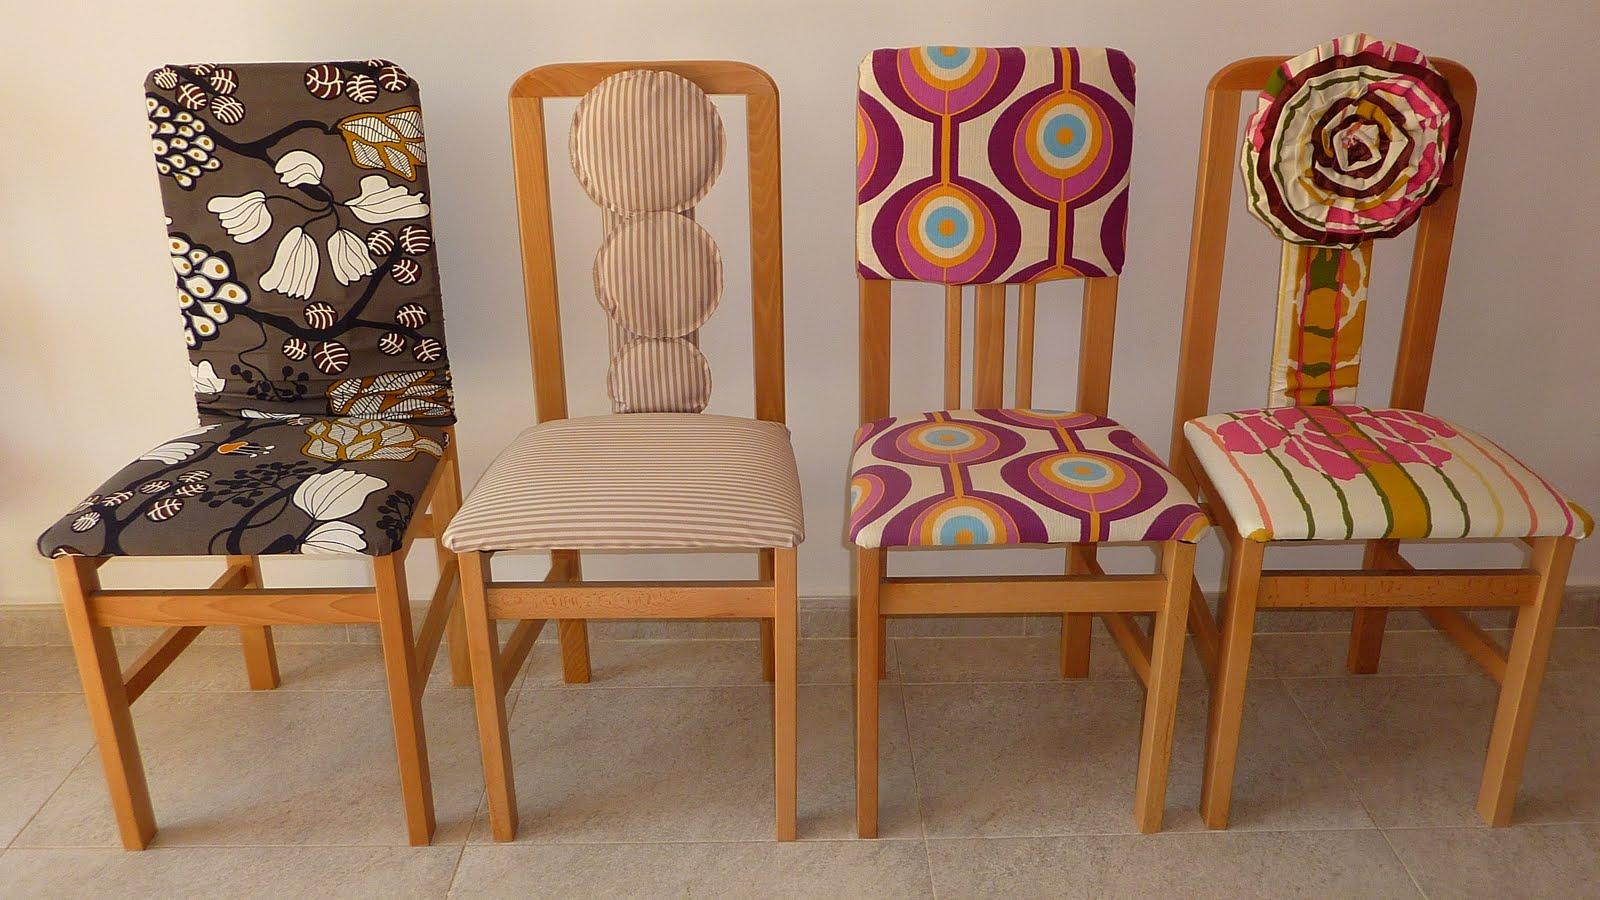 tarti arti en tarti arti tambi n nos ocupamos de personalizar muebles. Black Bedroom Furniture Sets. Home Design Ideas